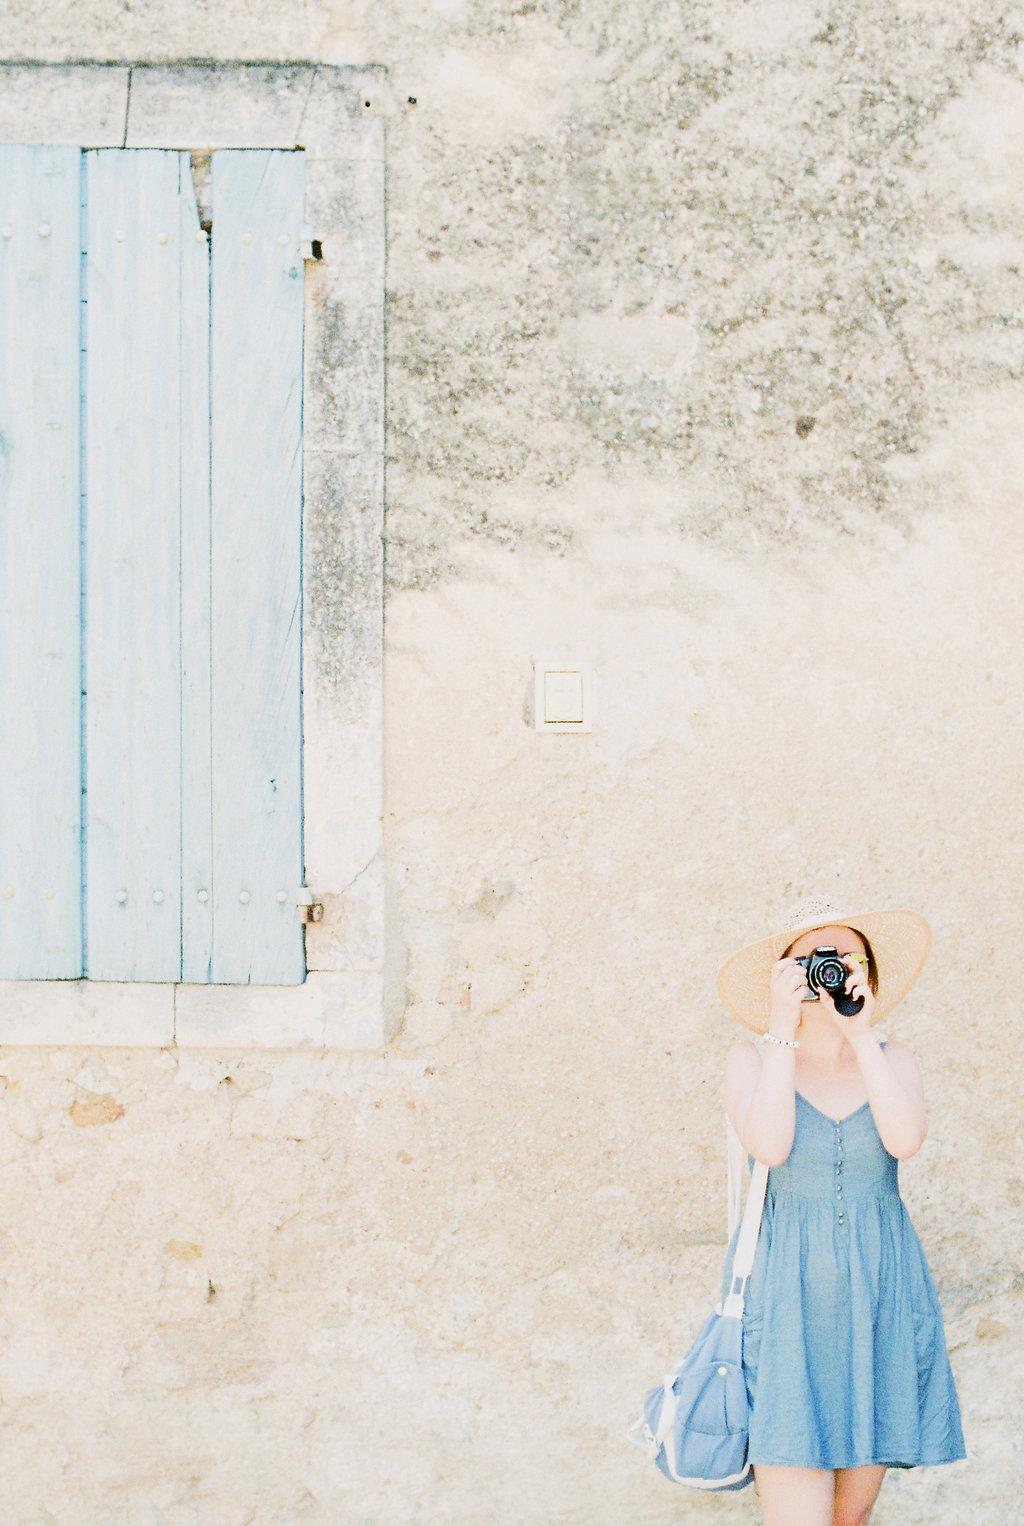 Anna_Provence2016-253Kbisкопия.jpg